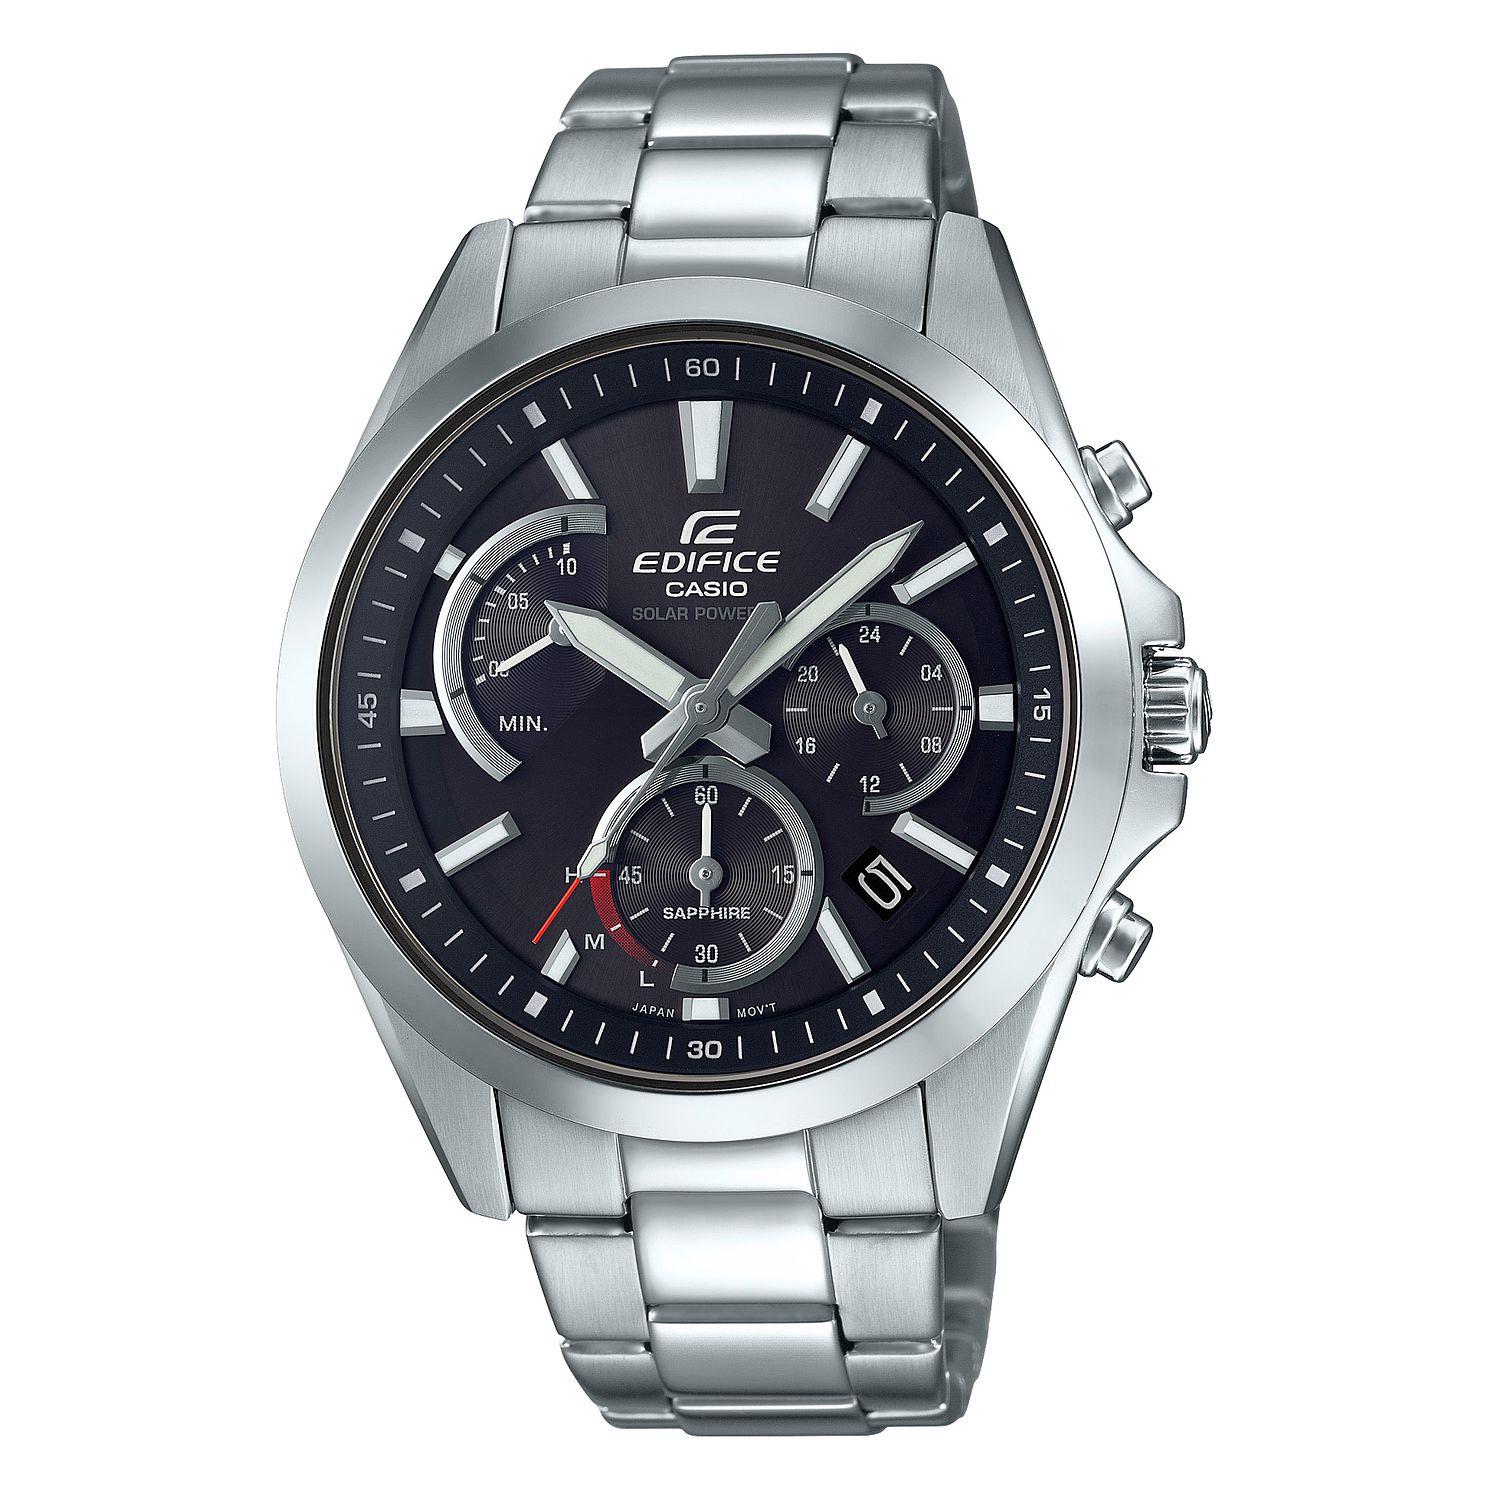 Casio Edifice Stainless Steel Bracelet Sapphire Solar Powered Watch - £80.75 at H.Samuel